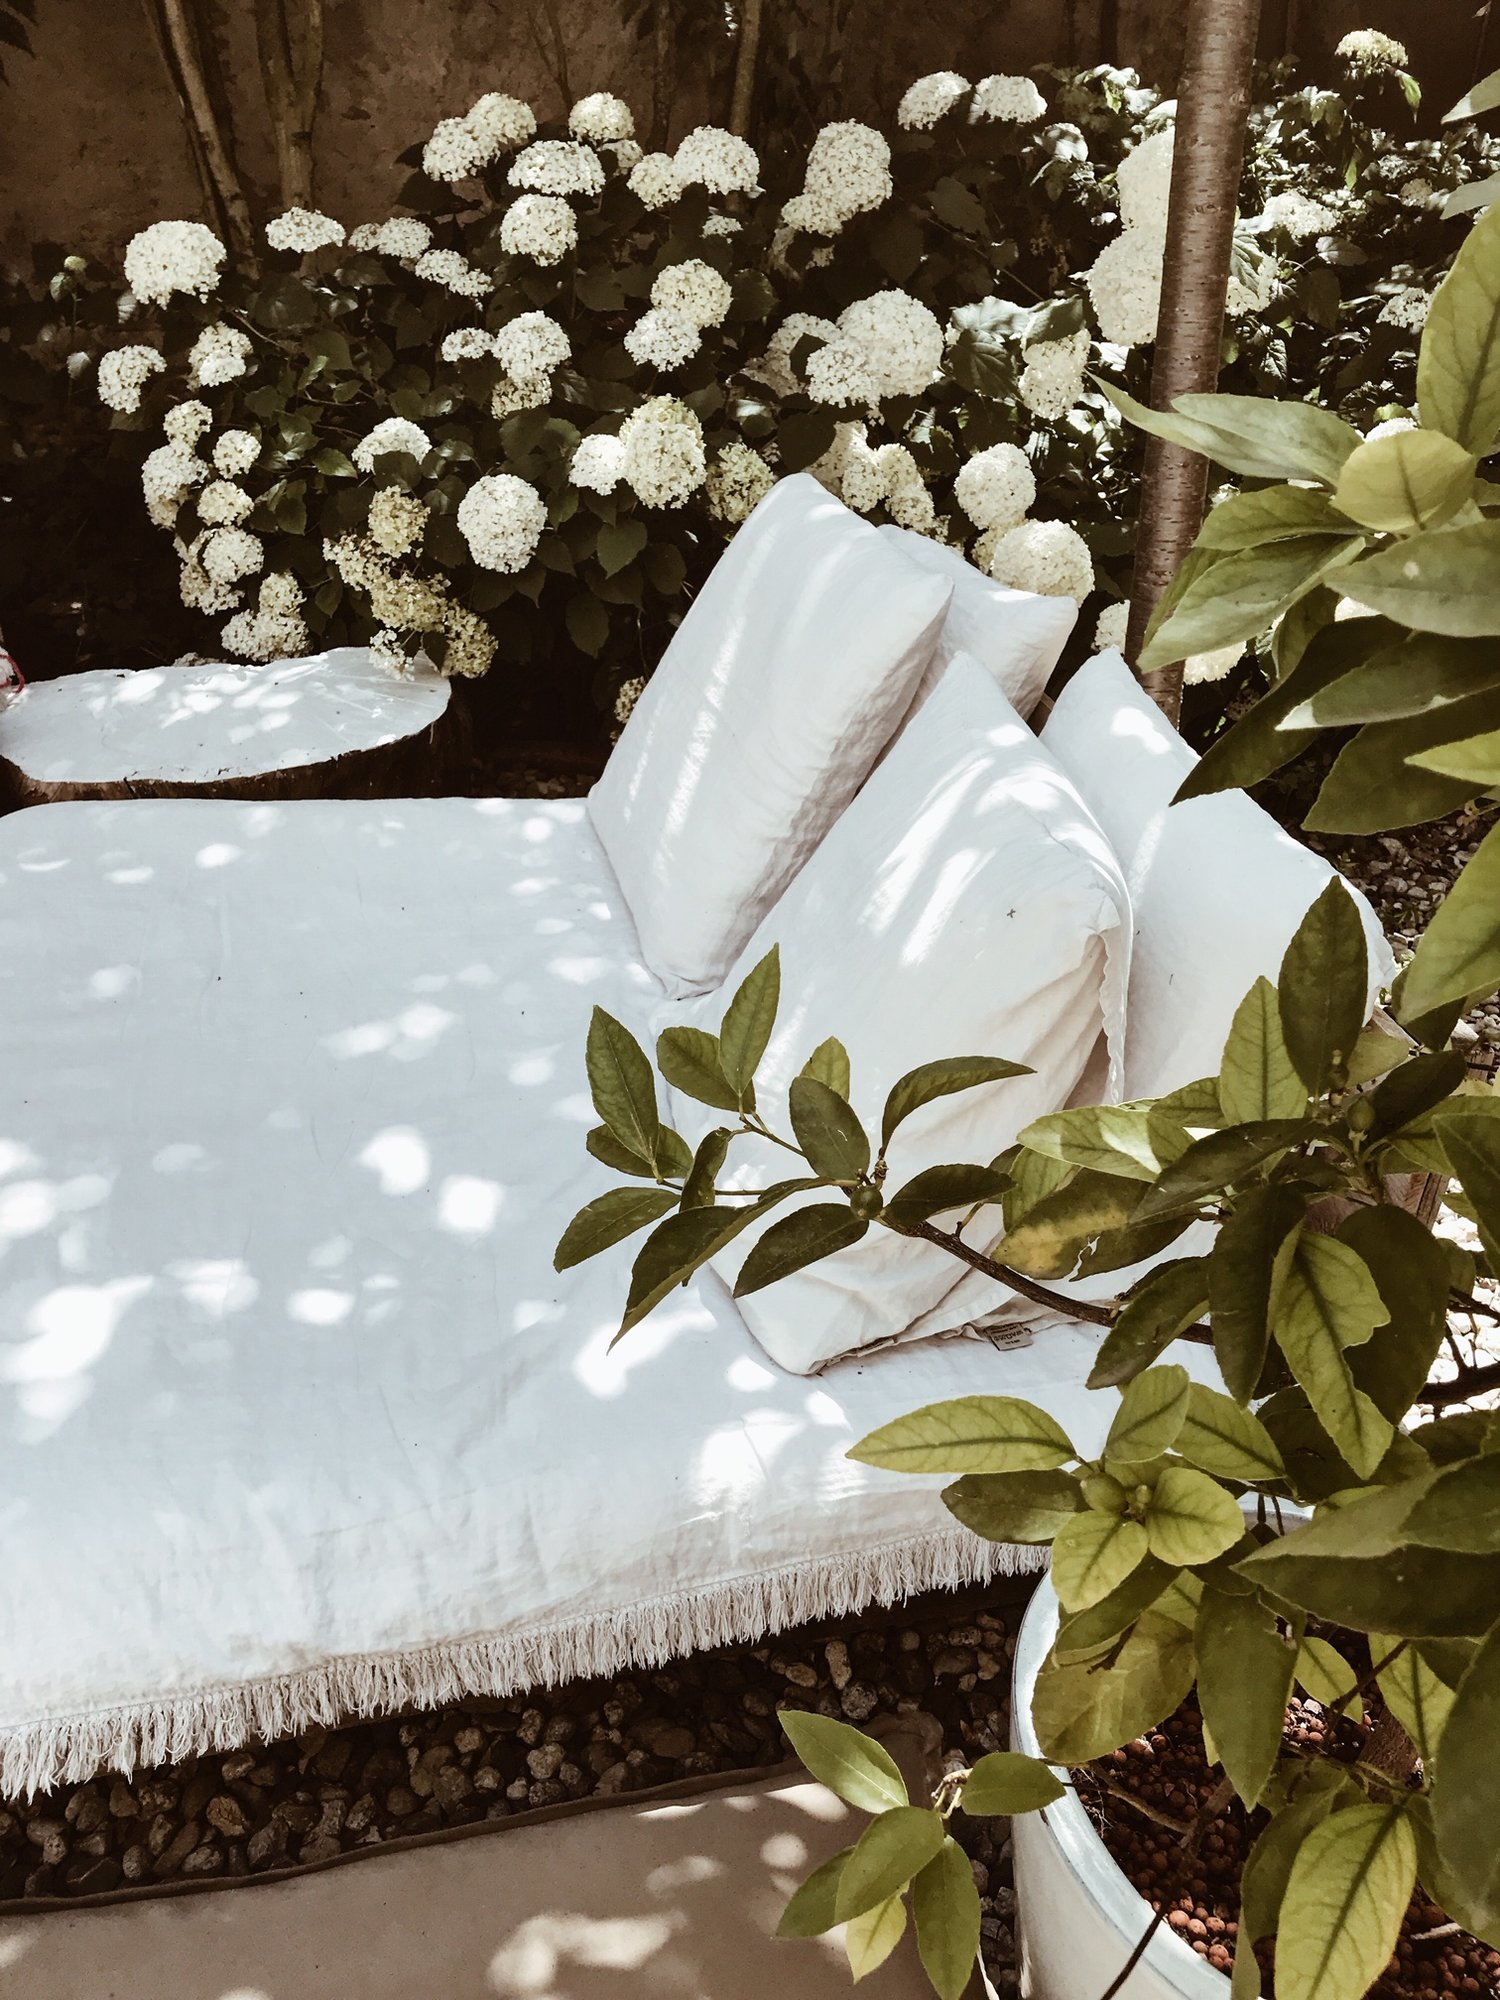 camellas-lloret-maison-d'hotes-garden-beds-linen.jpg